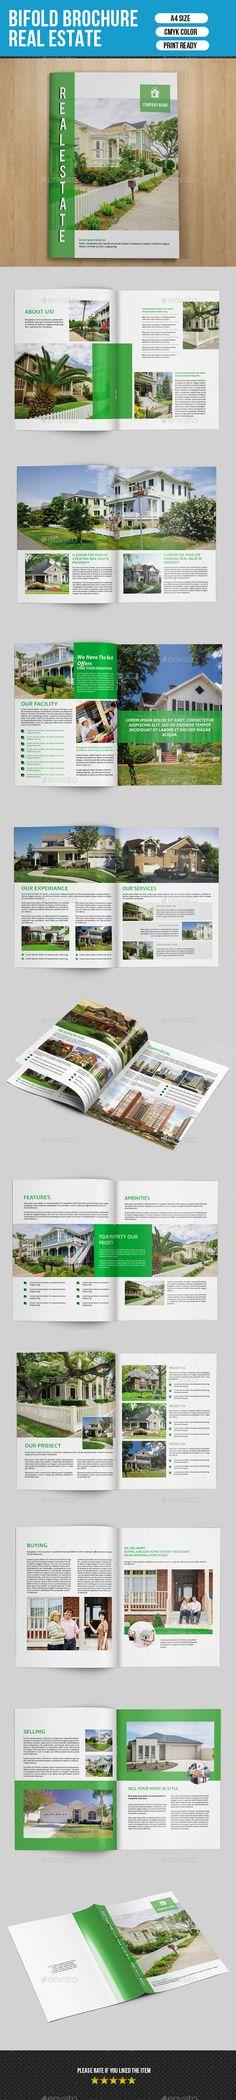 Real Estate Brochure v163 — InDesign INDD #green #ecologic • Available here → https://graphicriver.net/item/real-estate-brochure-v163/9589491?ref=pxcr